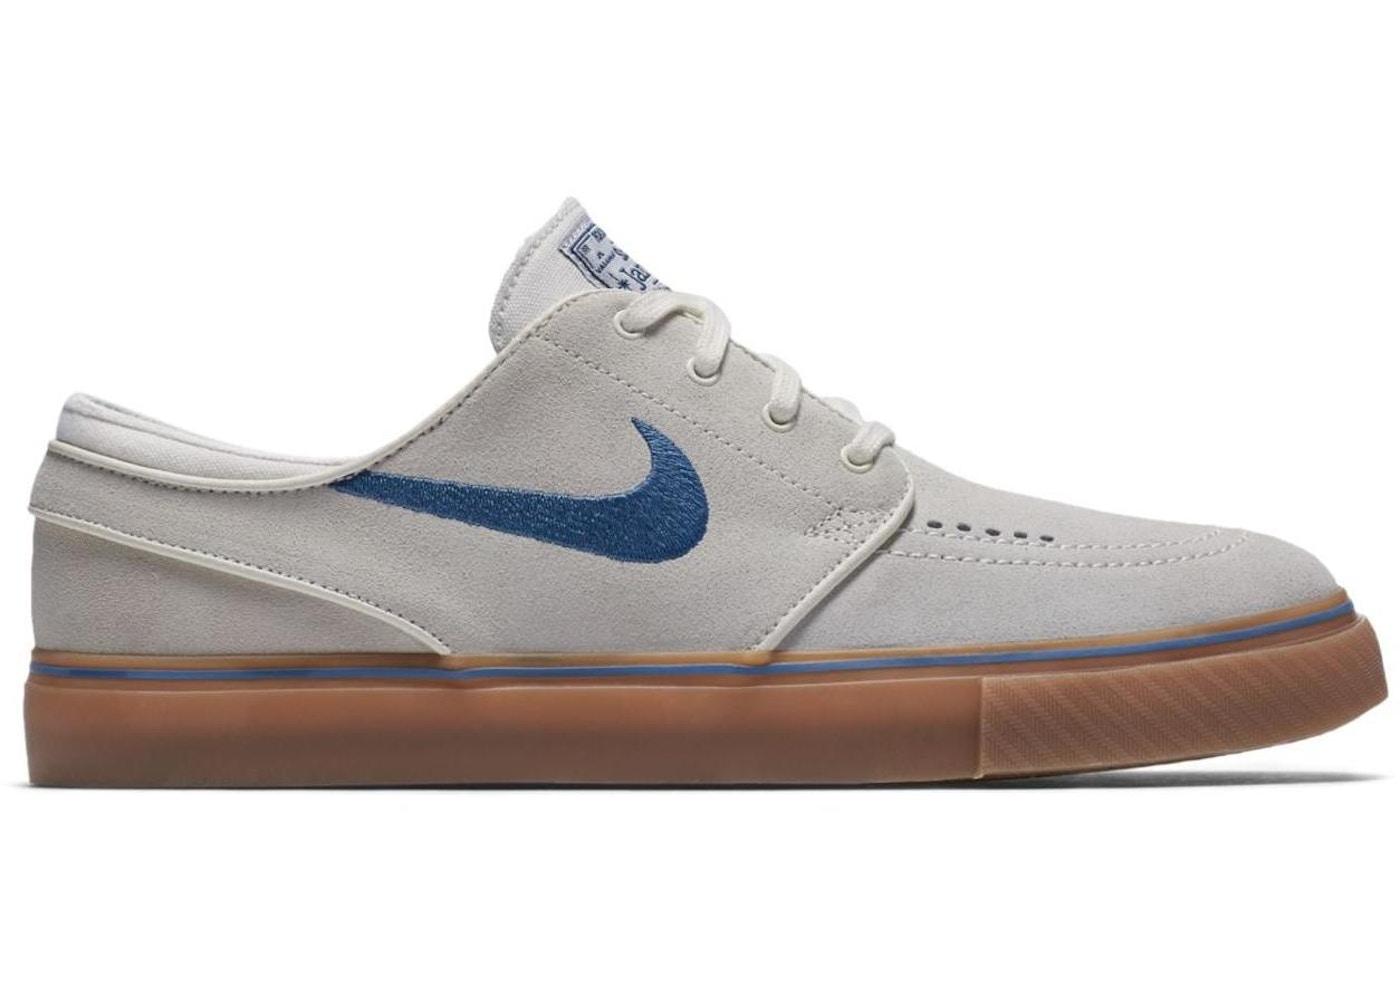 42cc6840fbb0 Sell. or Ask. Size 9. View All Bids. Nike SB Stefan Janoski Ivory Blue